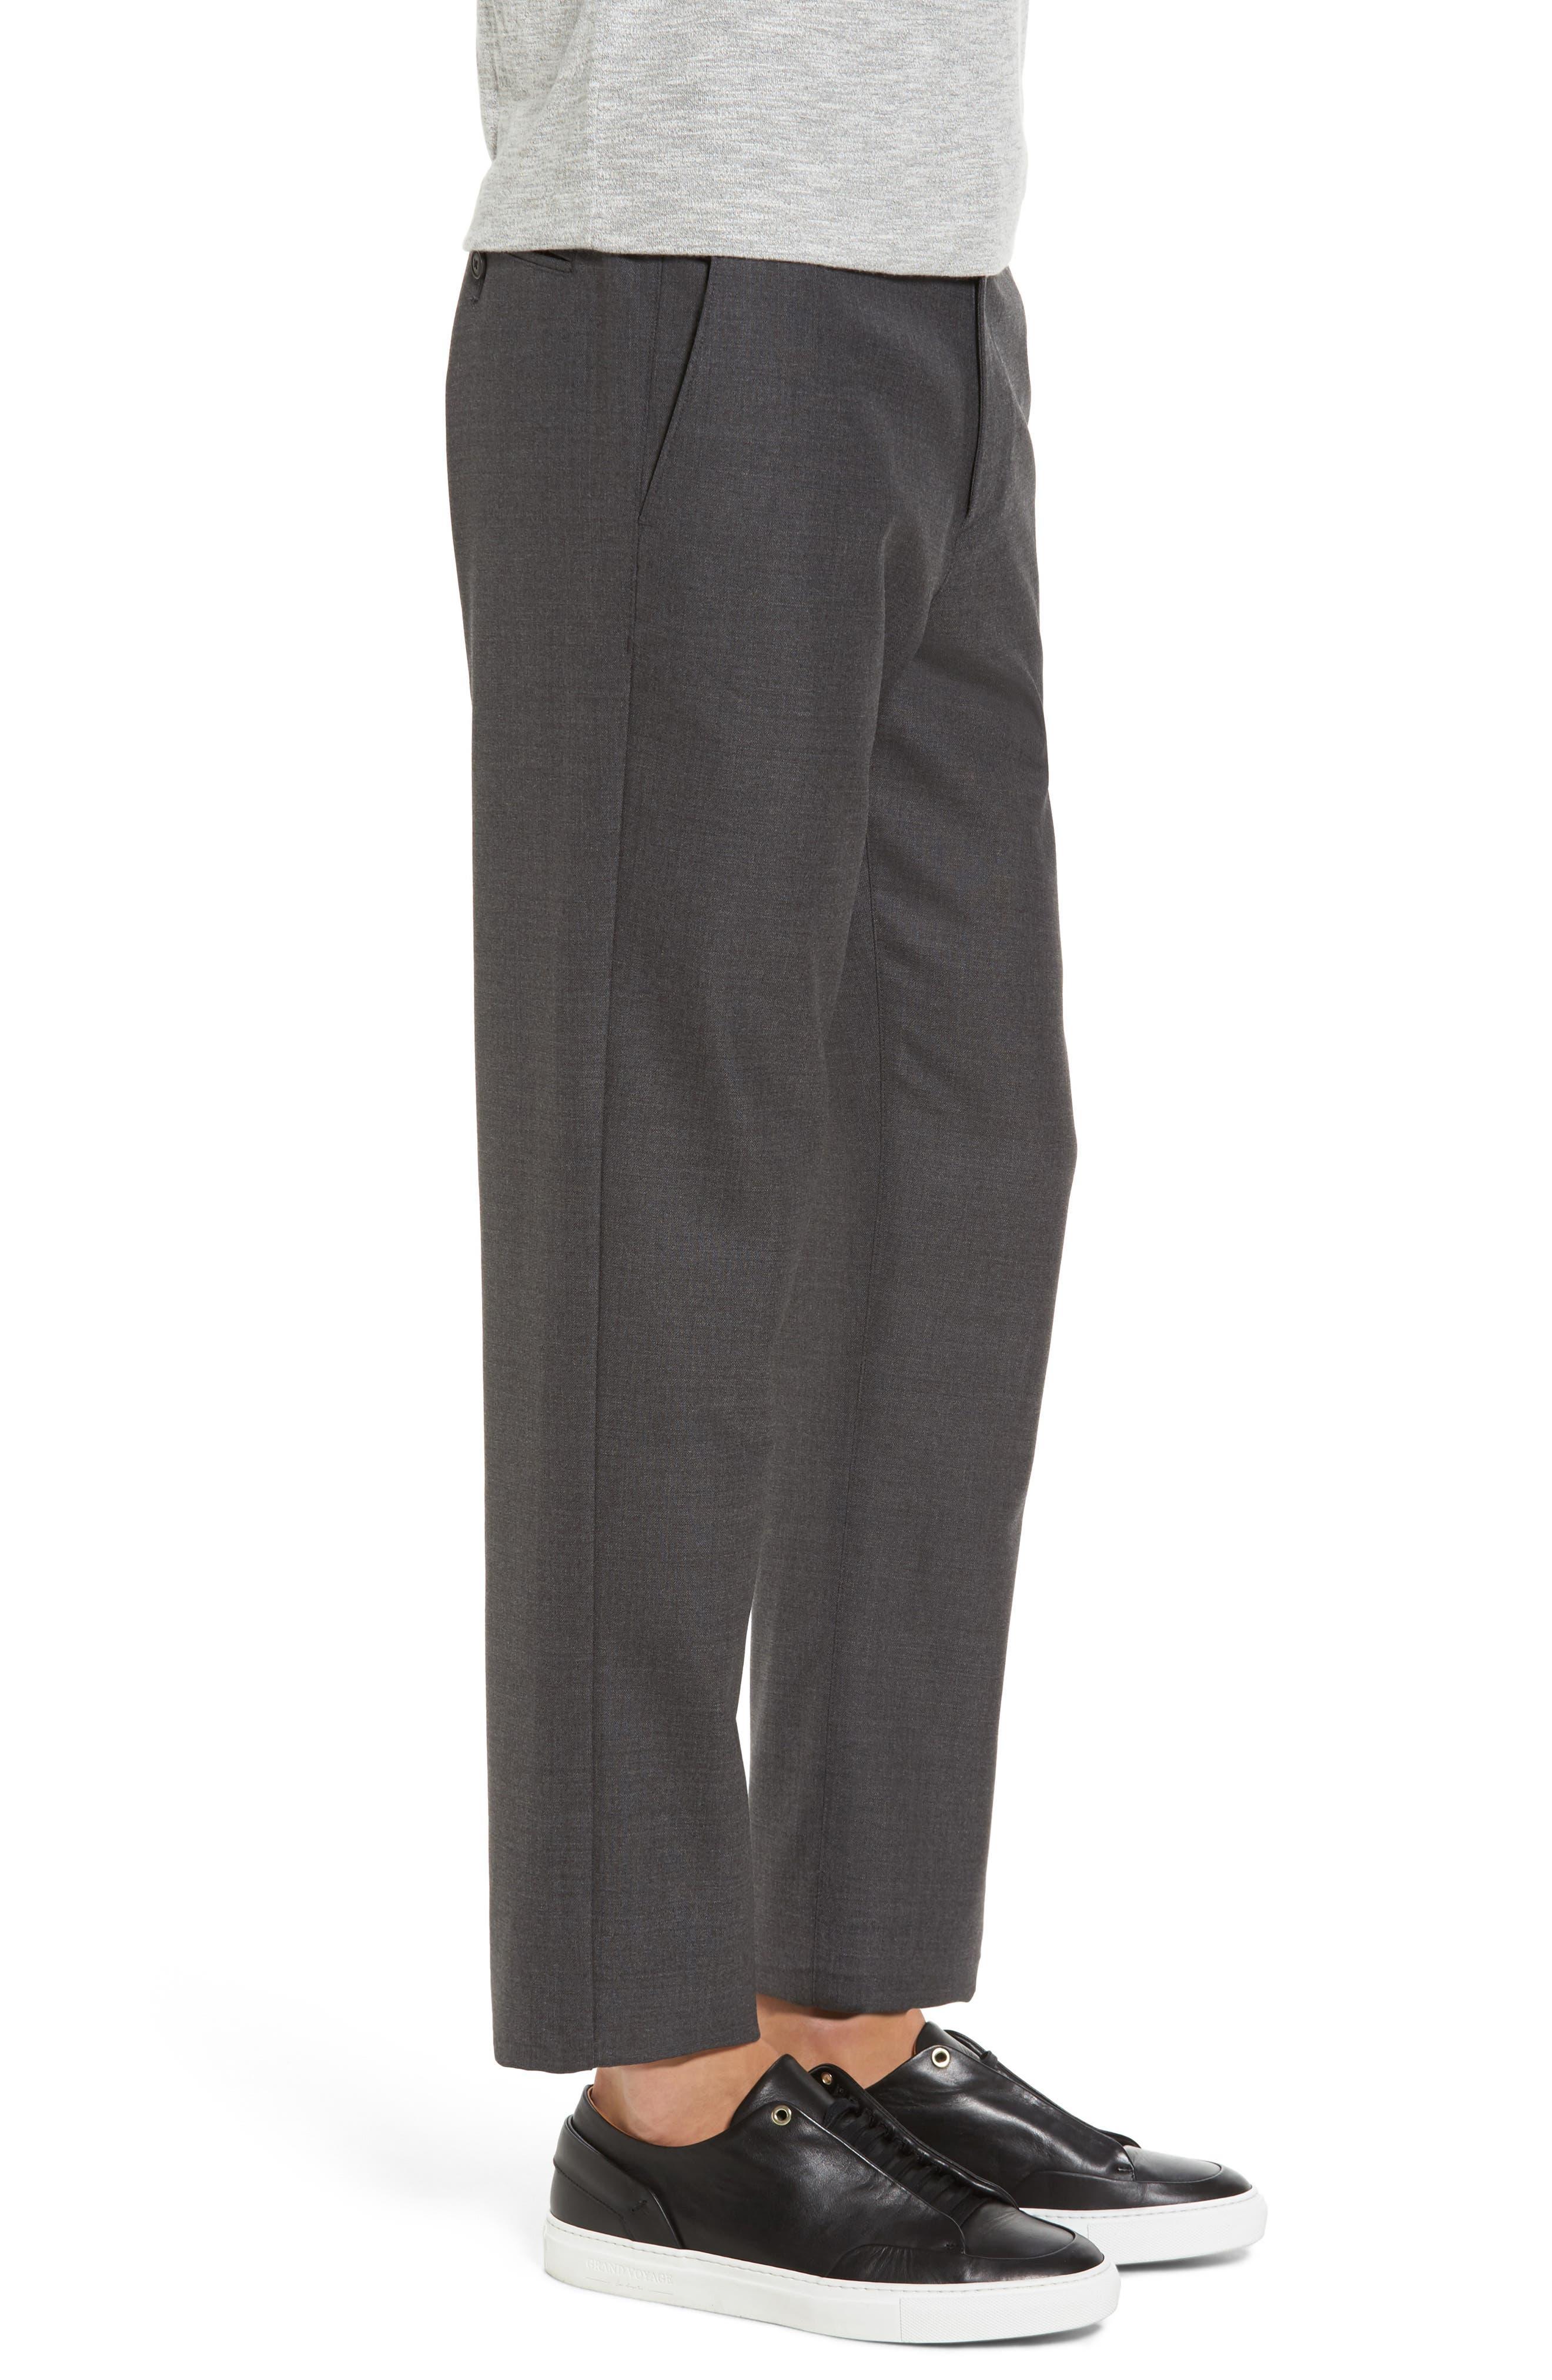 Zaine Gearheart Slim Straight Pants,                             Alternate thumbnail 3, color,                             Medium Charcoal